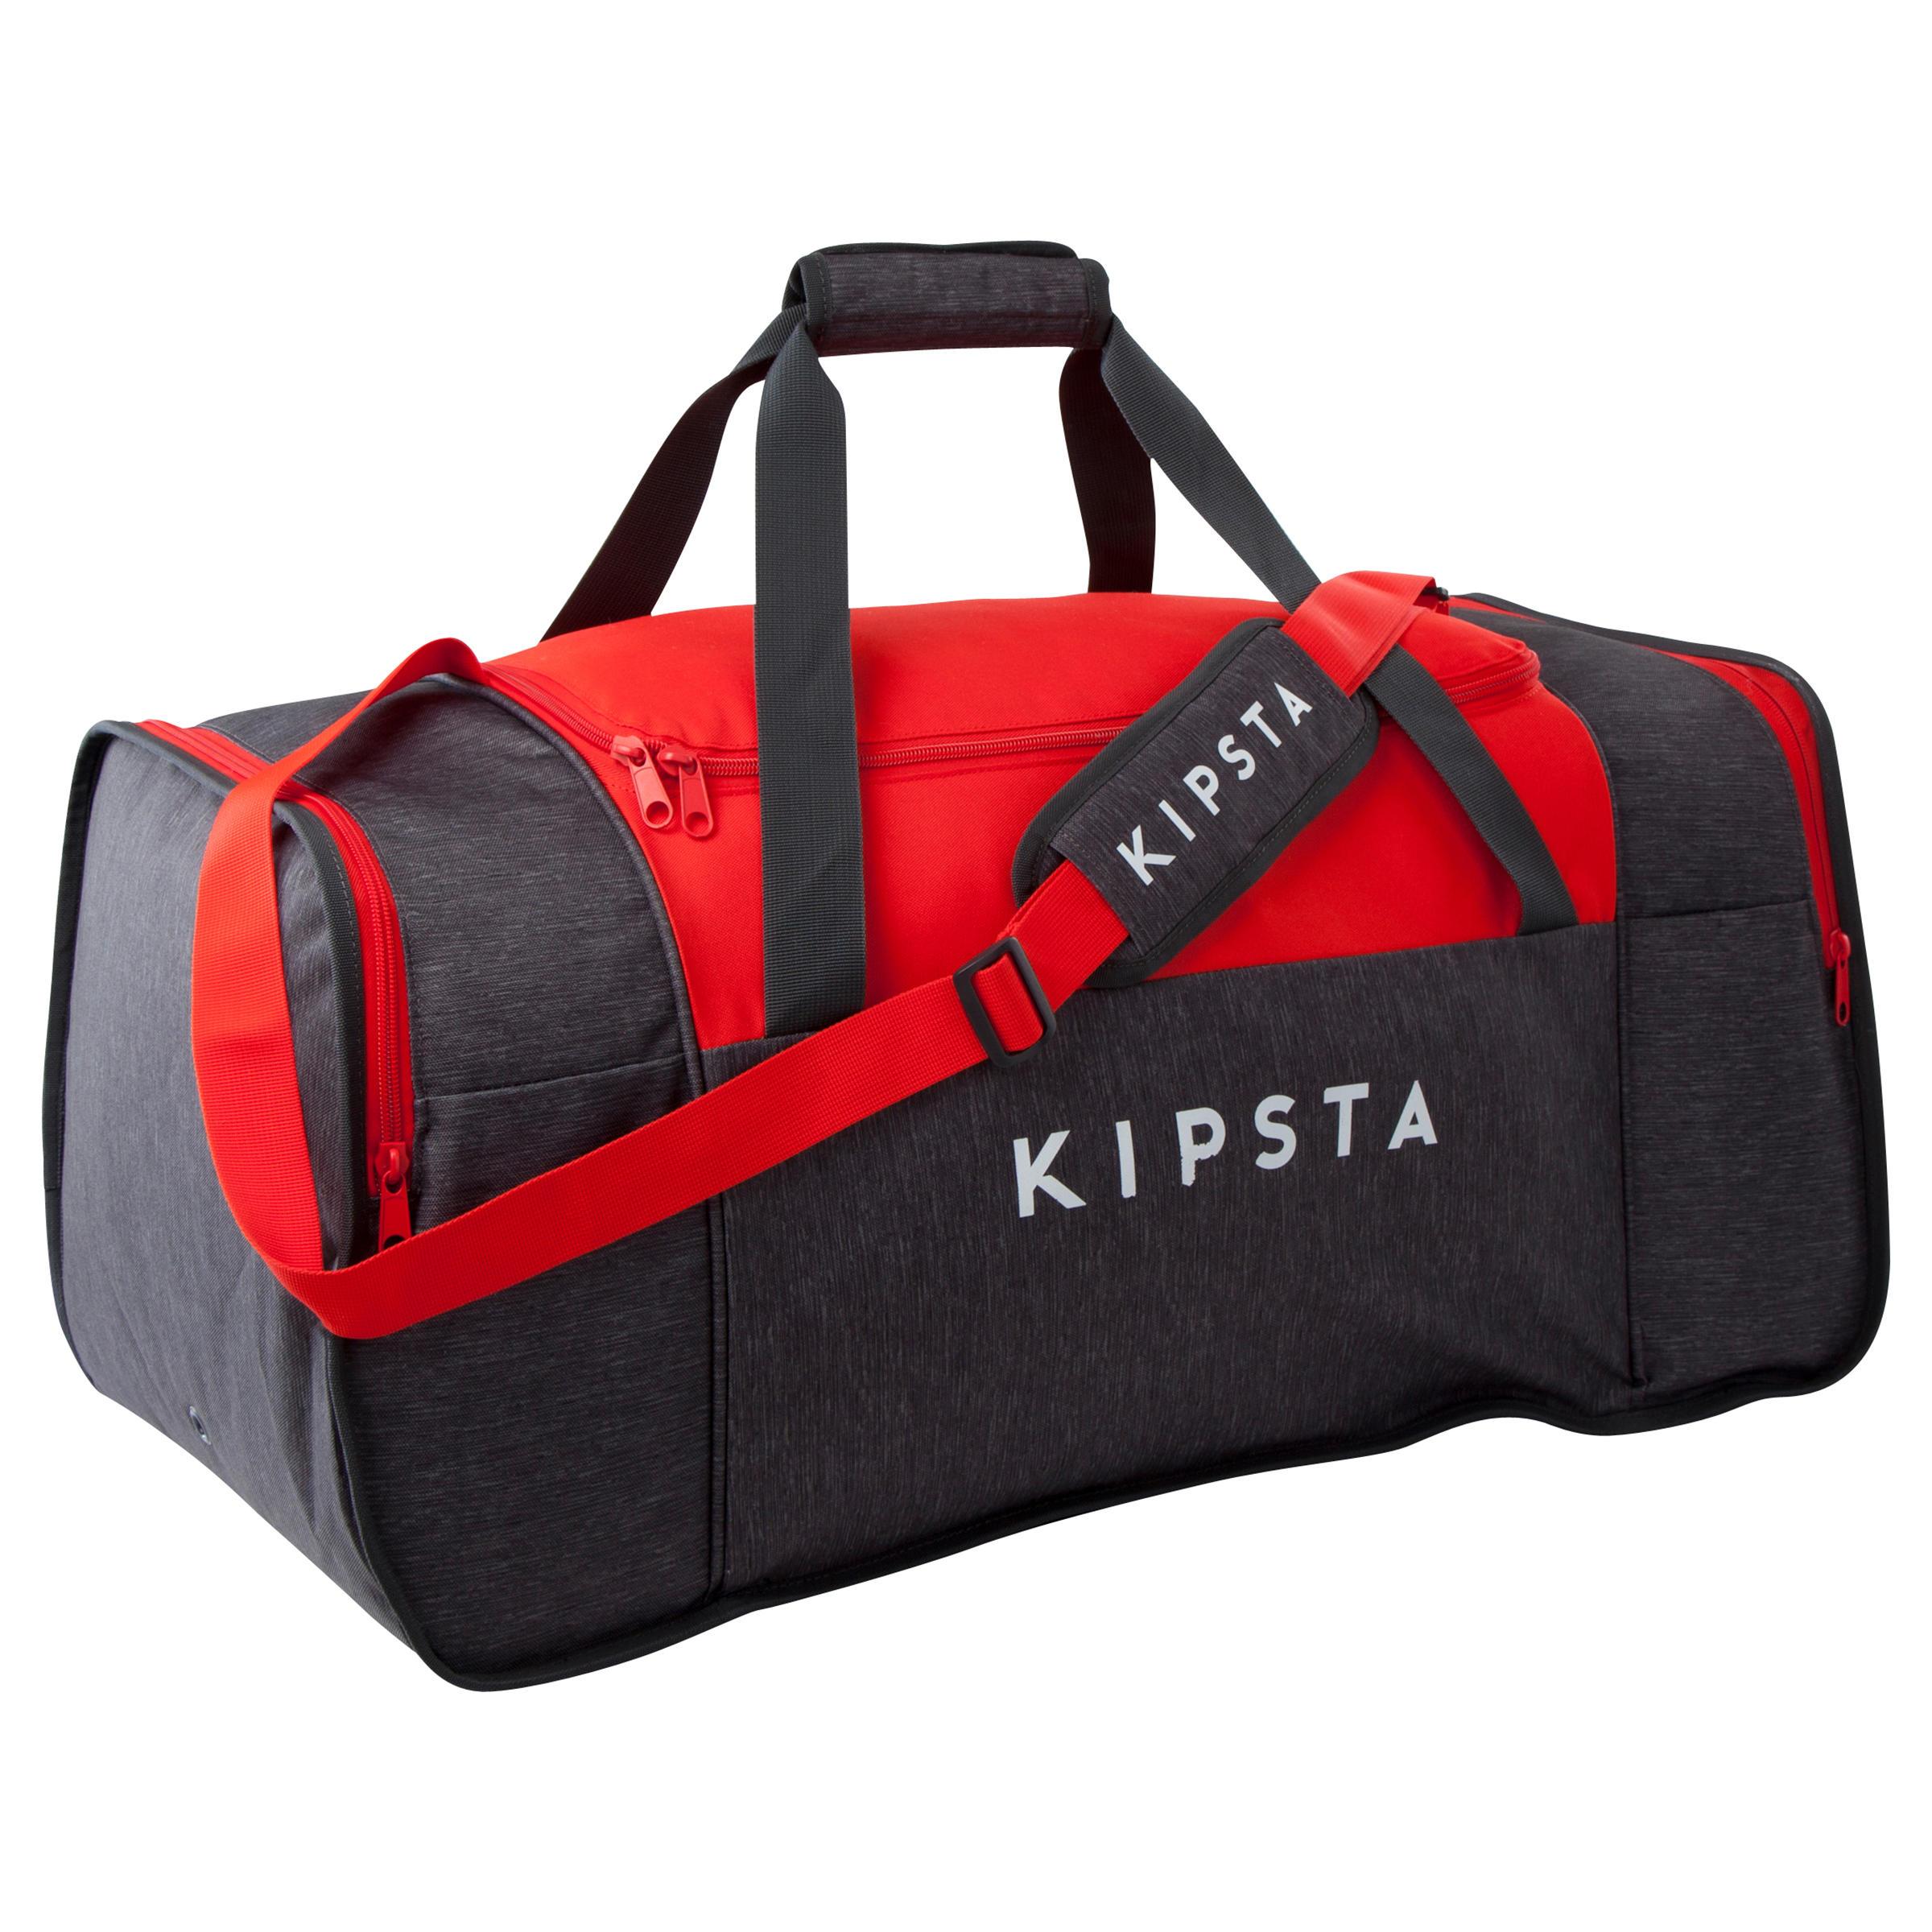 kipsta sac de sports collectifs kipocket 80 litres decathlon. Black Bedroom Furniture Sets. Home Design Ideas